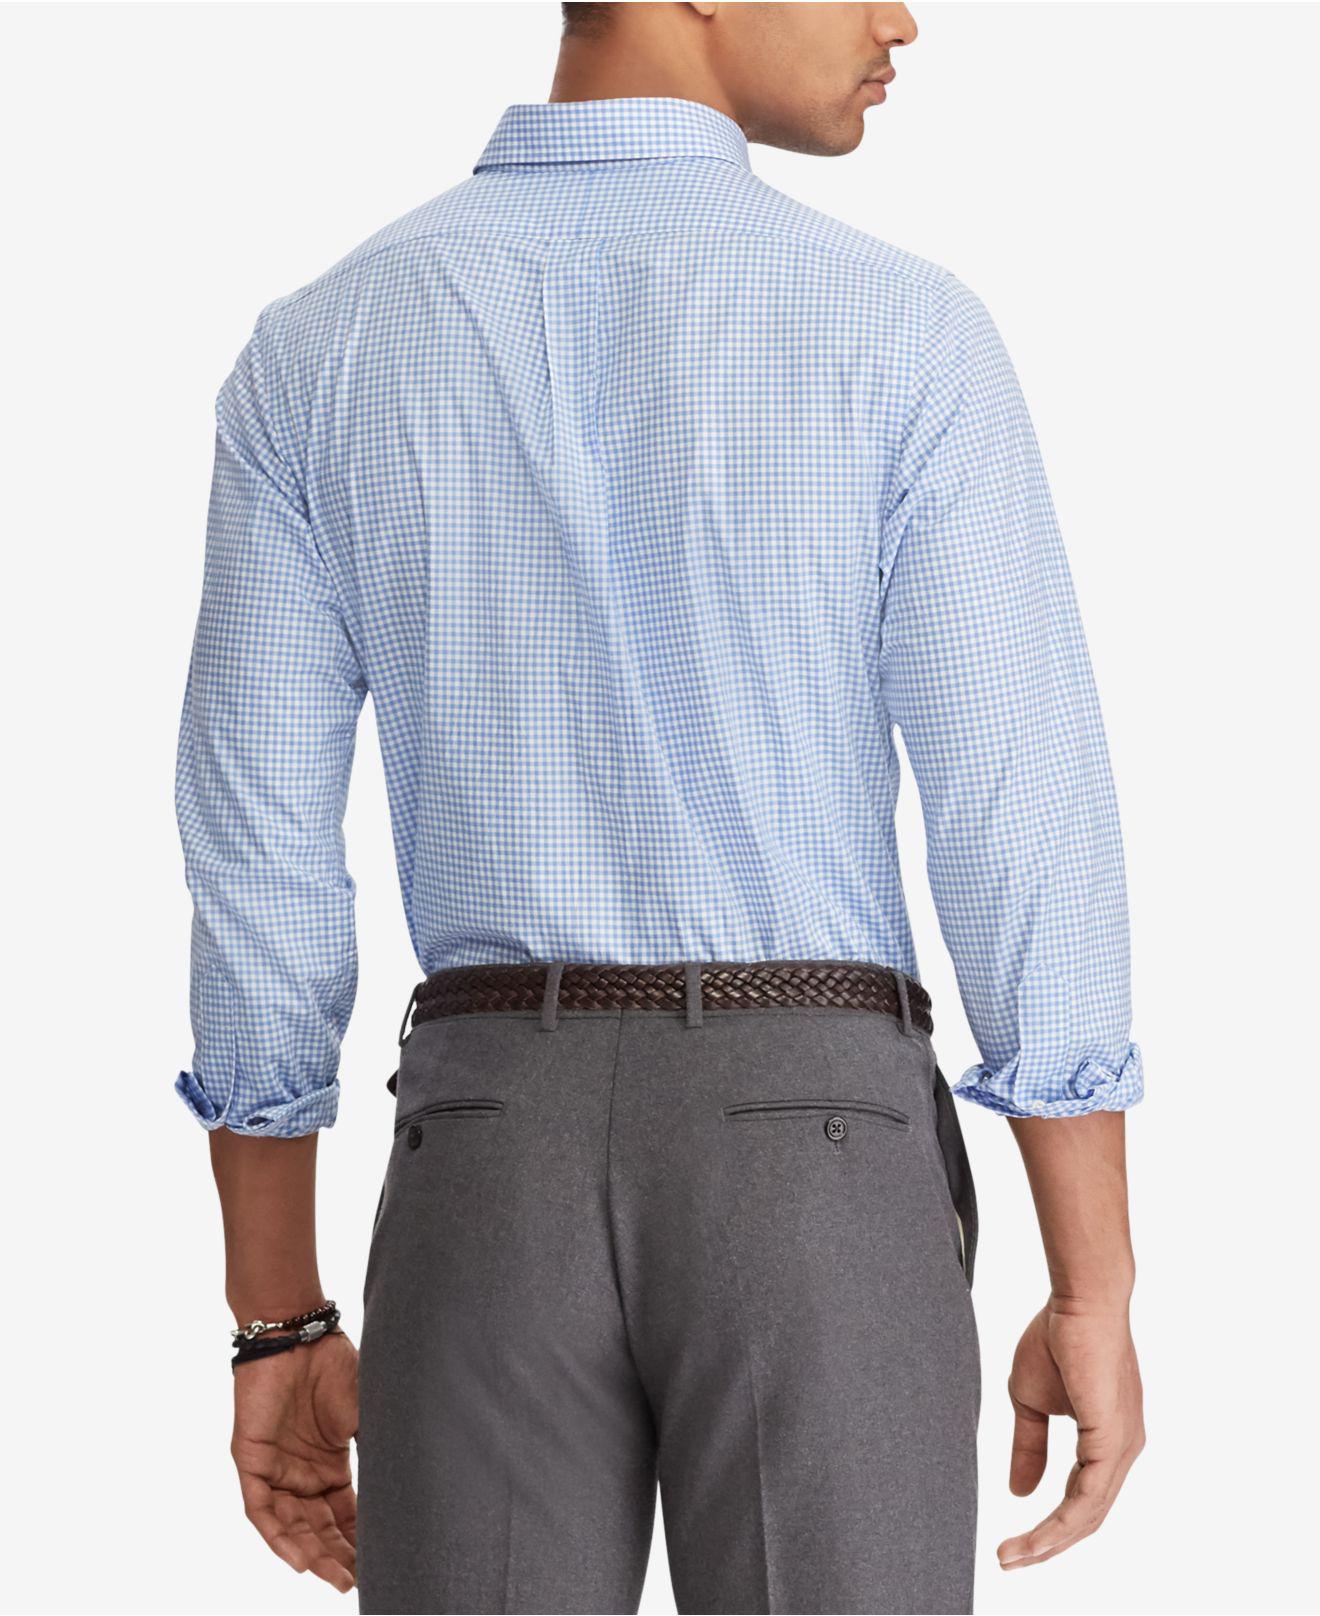 1545e43b28c Lyst - Polo Ralph Lauren Classic Fit Poplin Shirt in Blue for Men